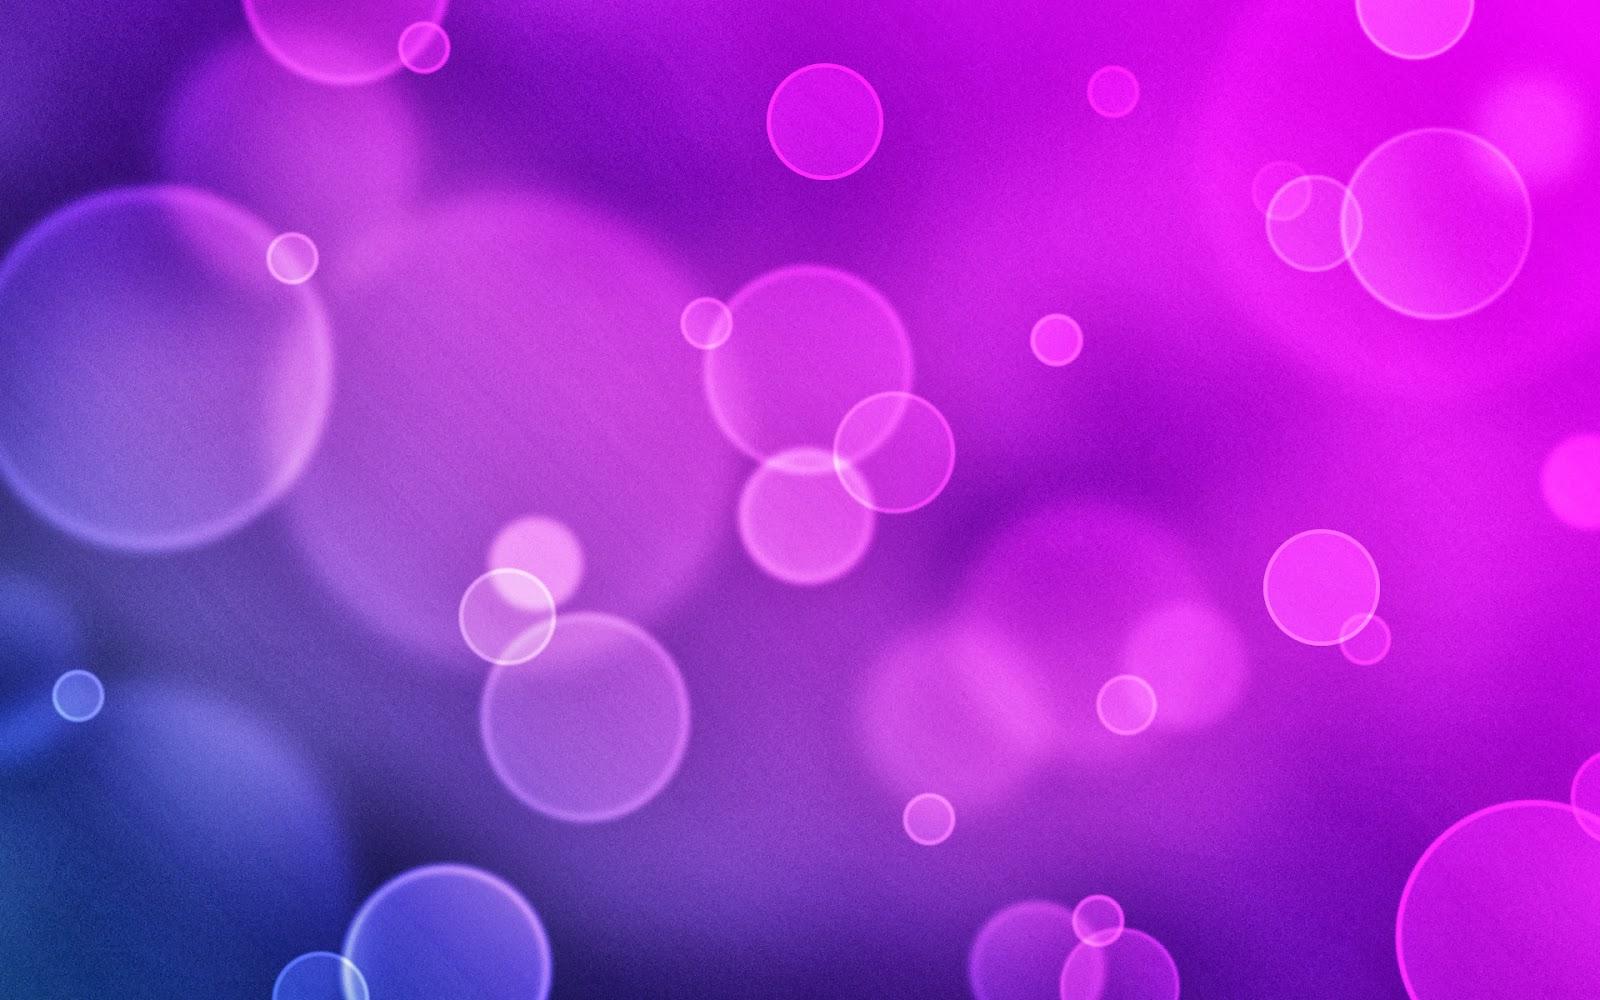 Purple Background Wallpaper Quotes QuotesGram 1600x1000